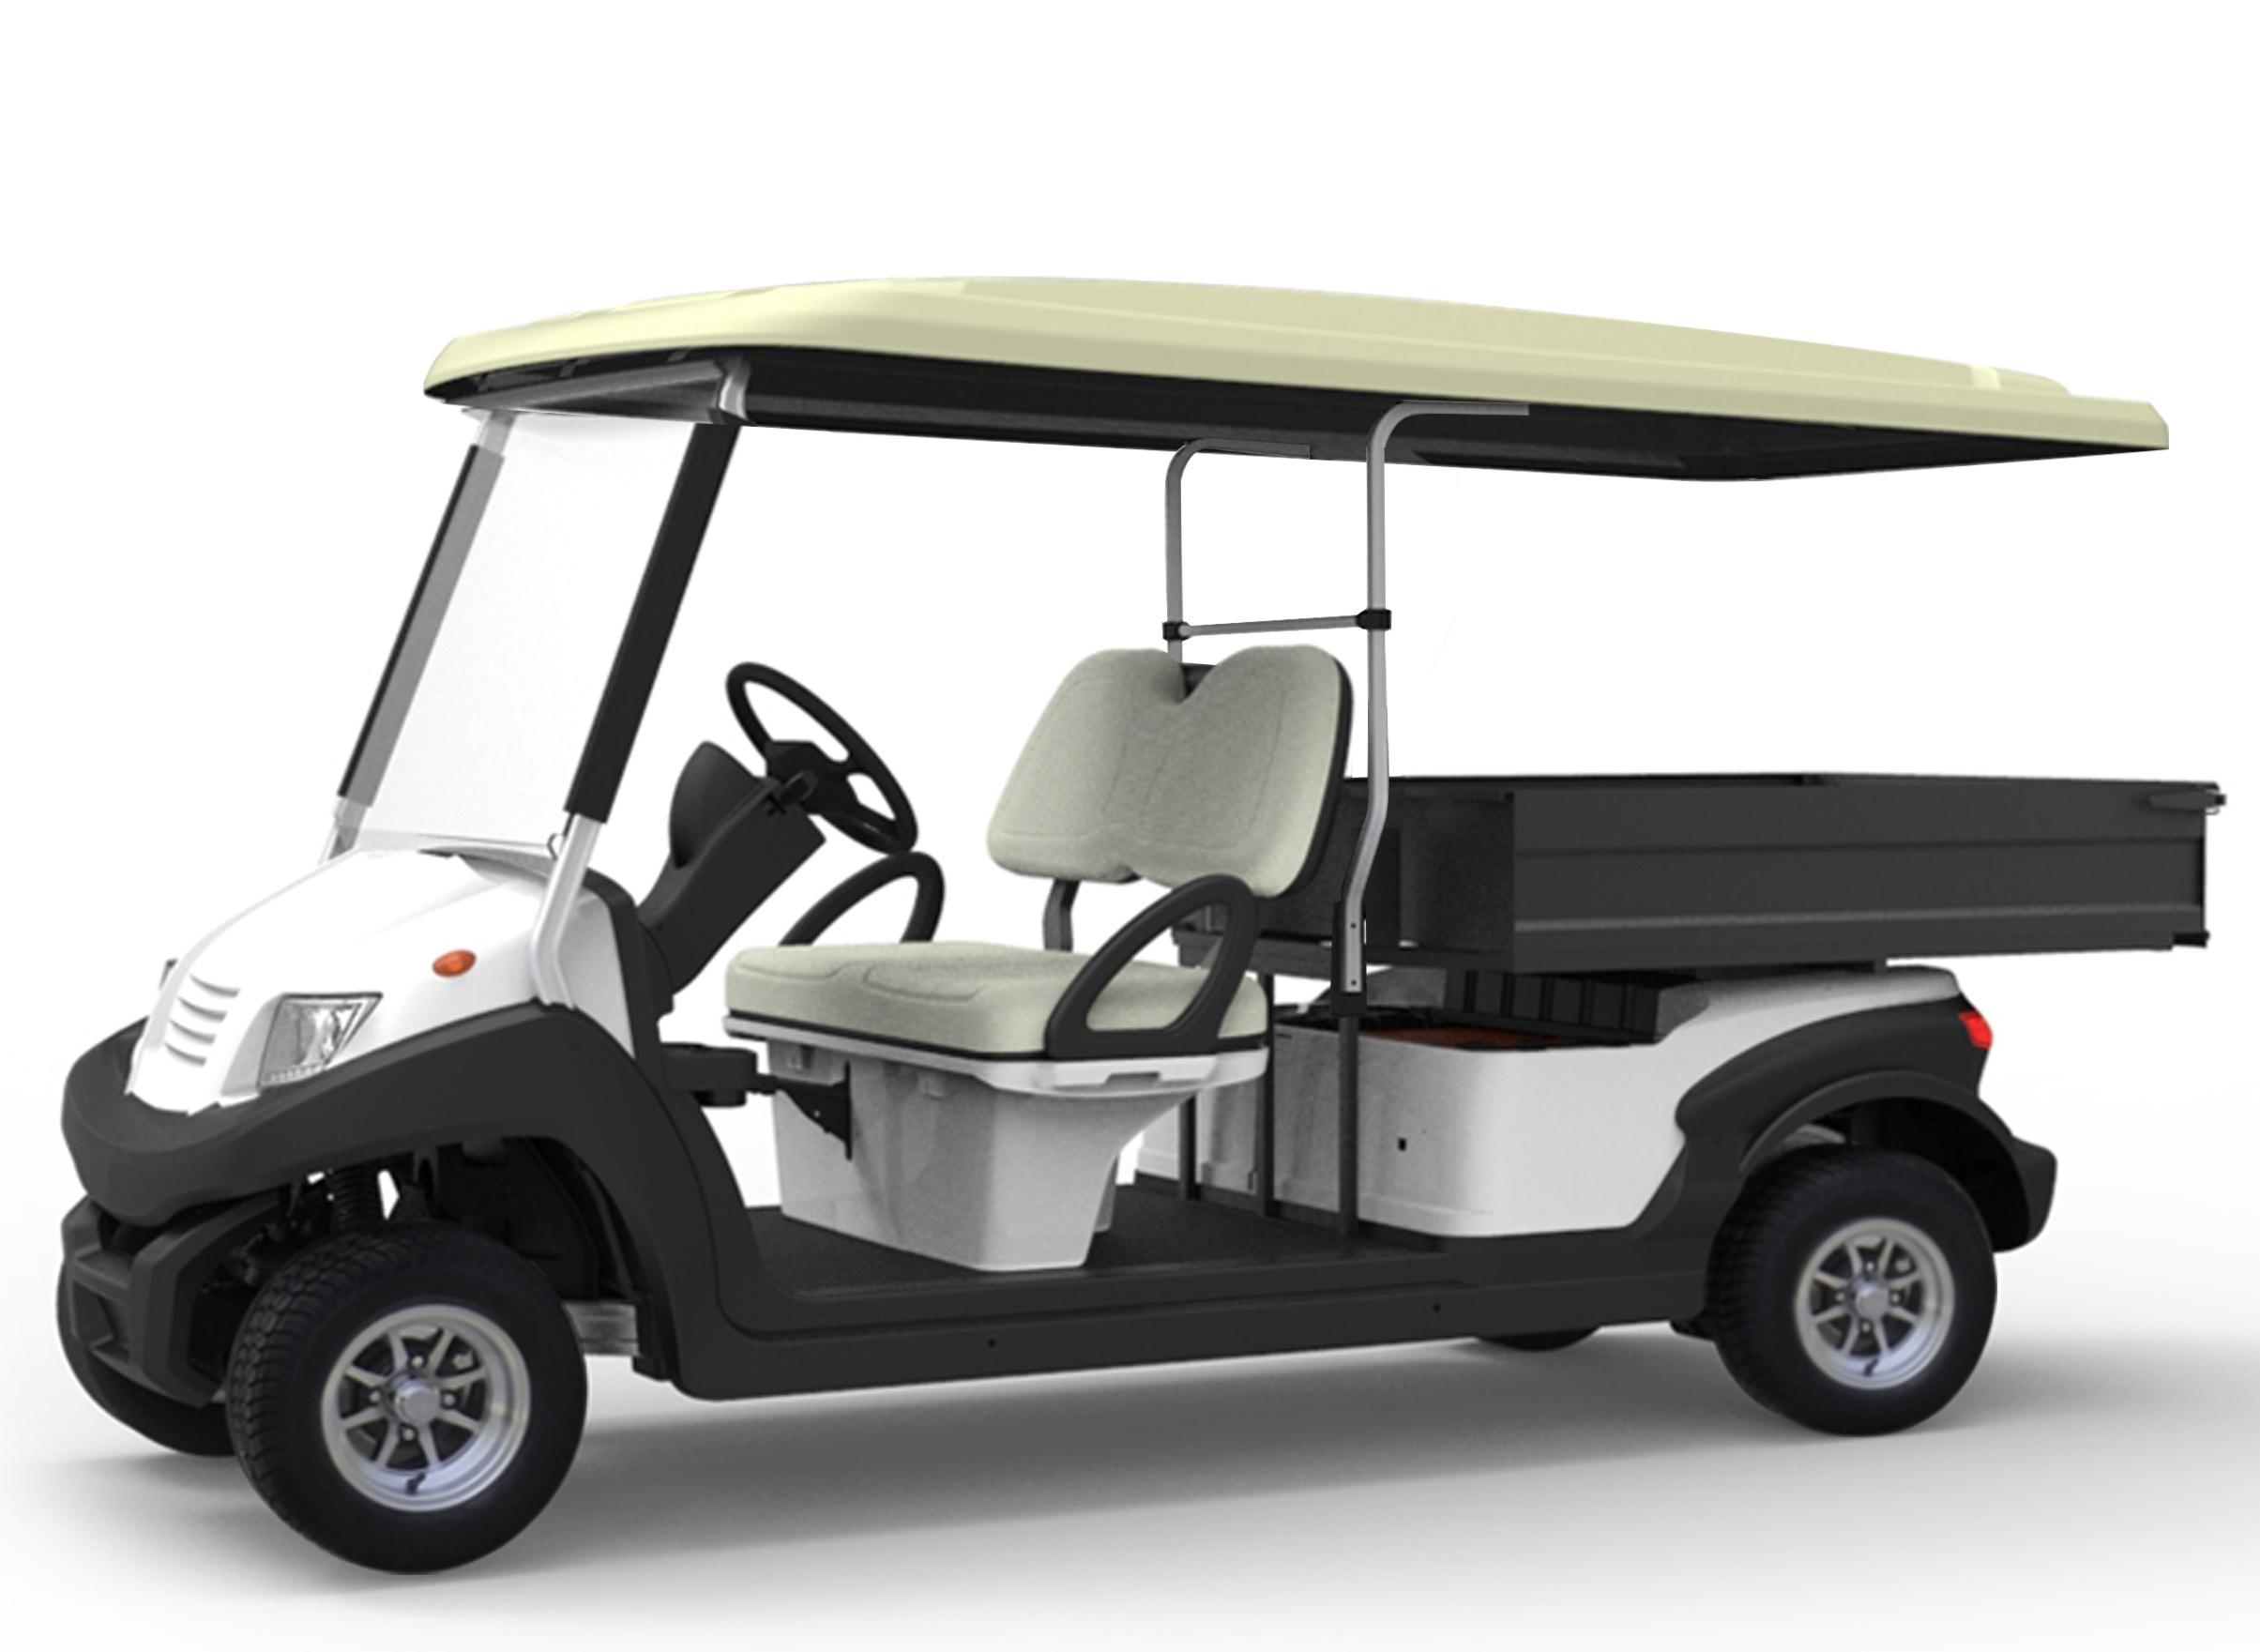 EG204AKSZT electric utility vehicle aluminum chassis